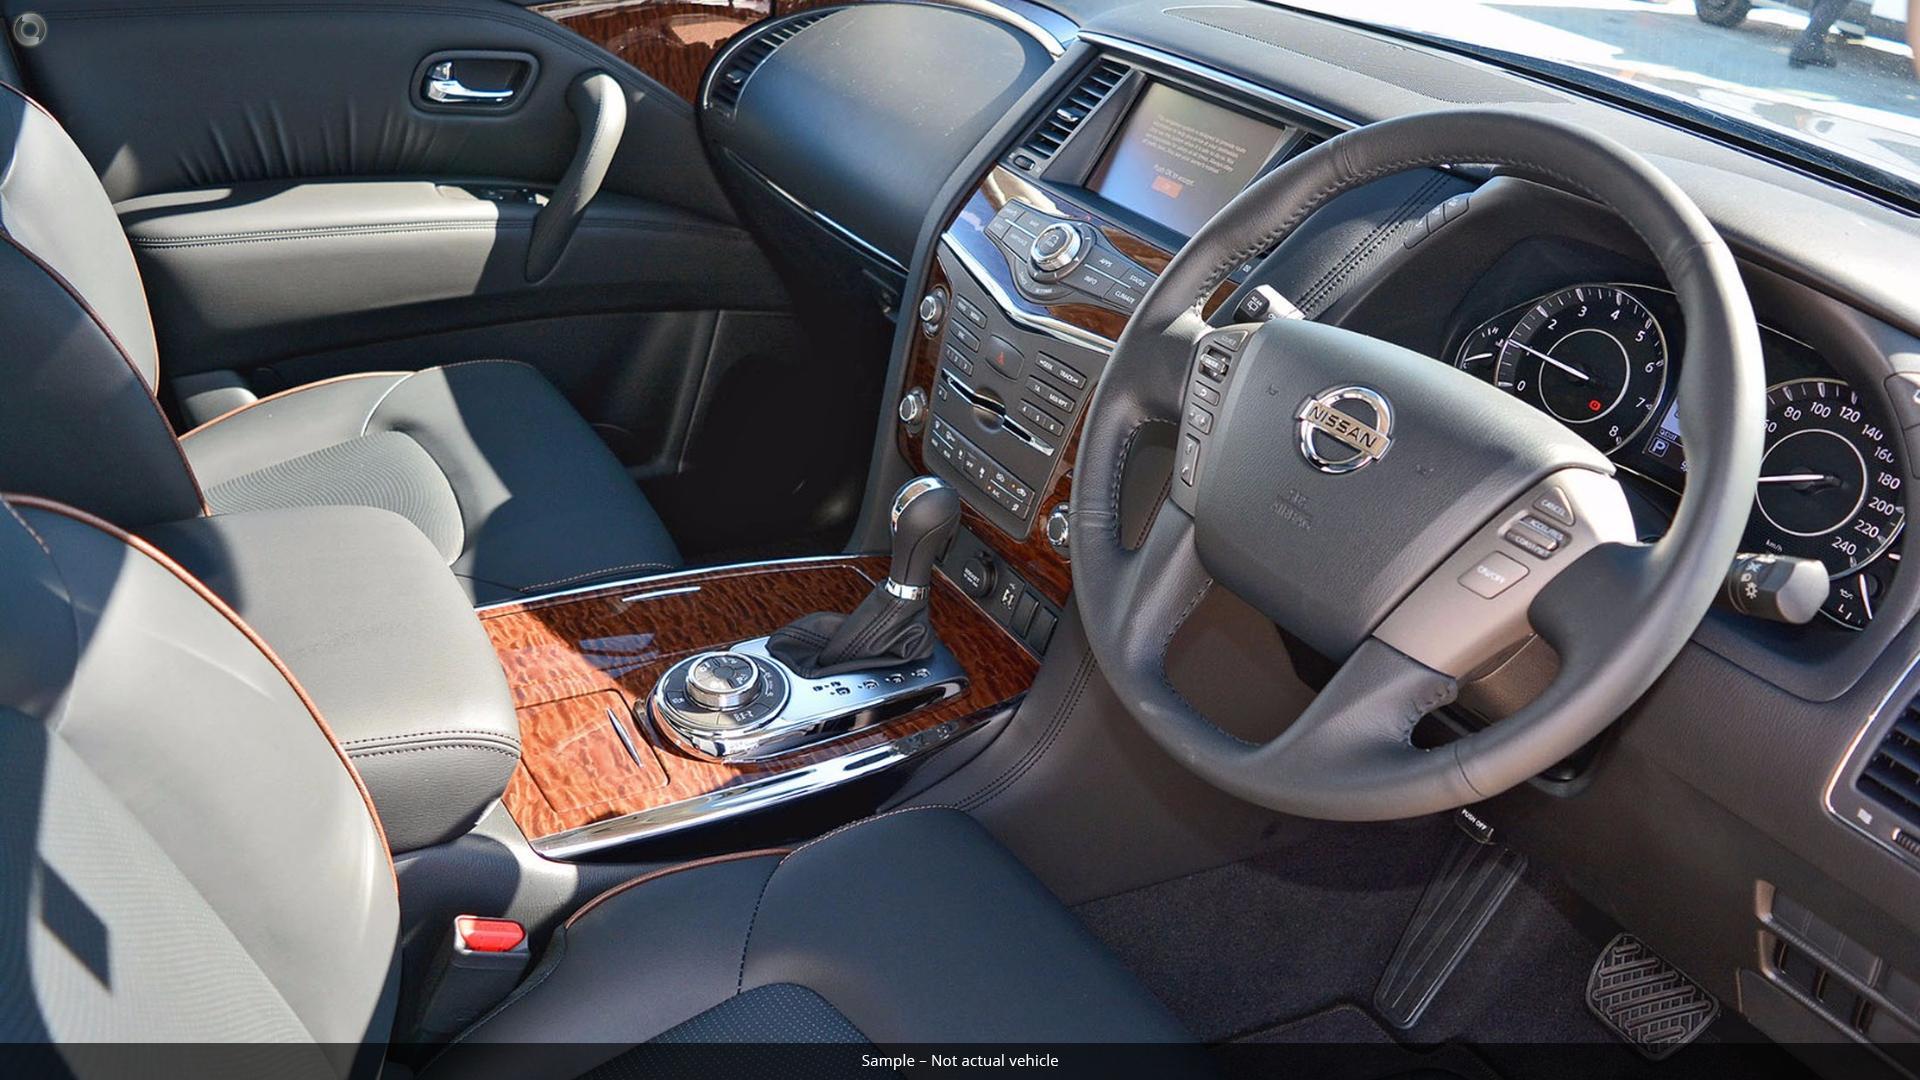 2019 Nissan Patrol Ti Y62 Series 4